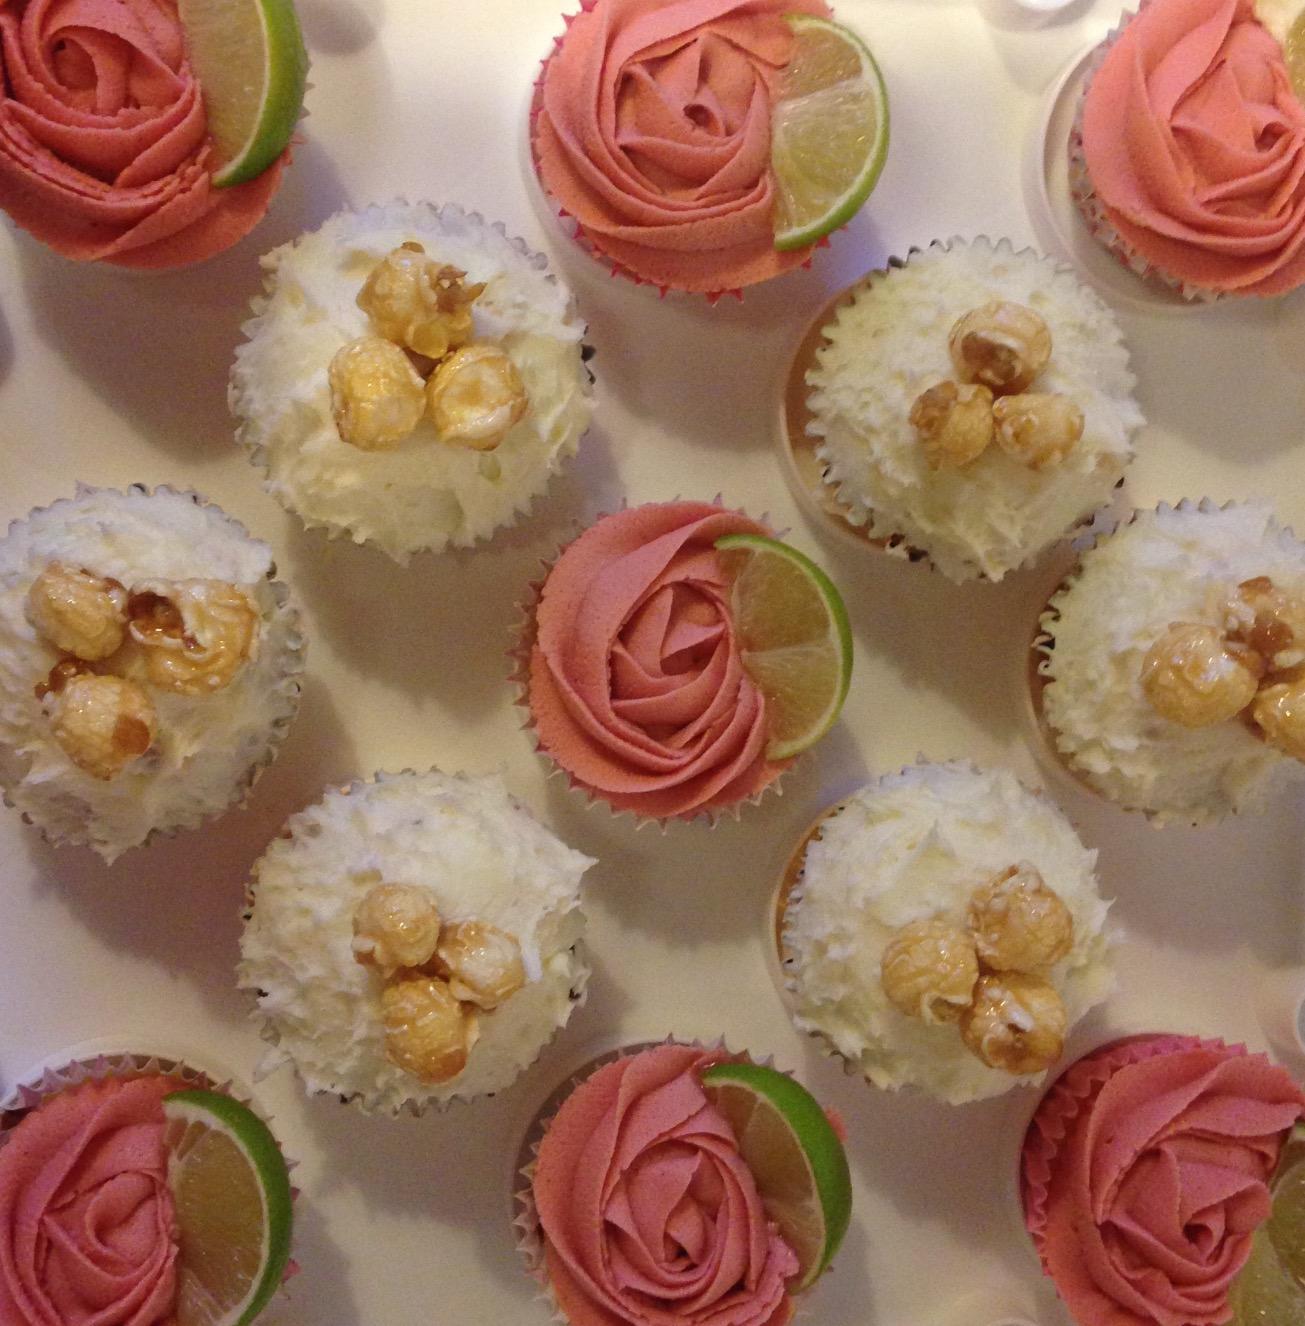 Cosmopolitan and Daiquiri Cupcake